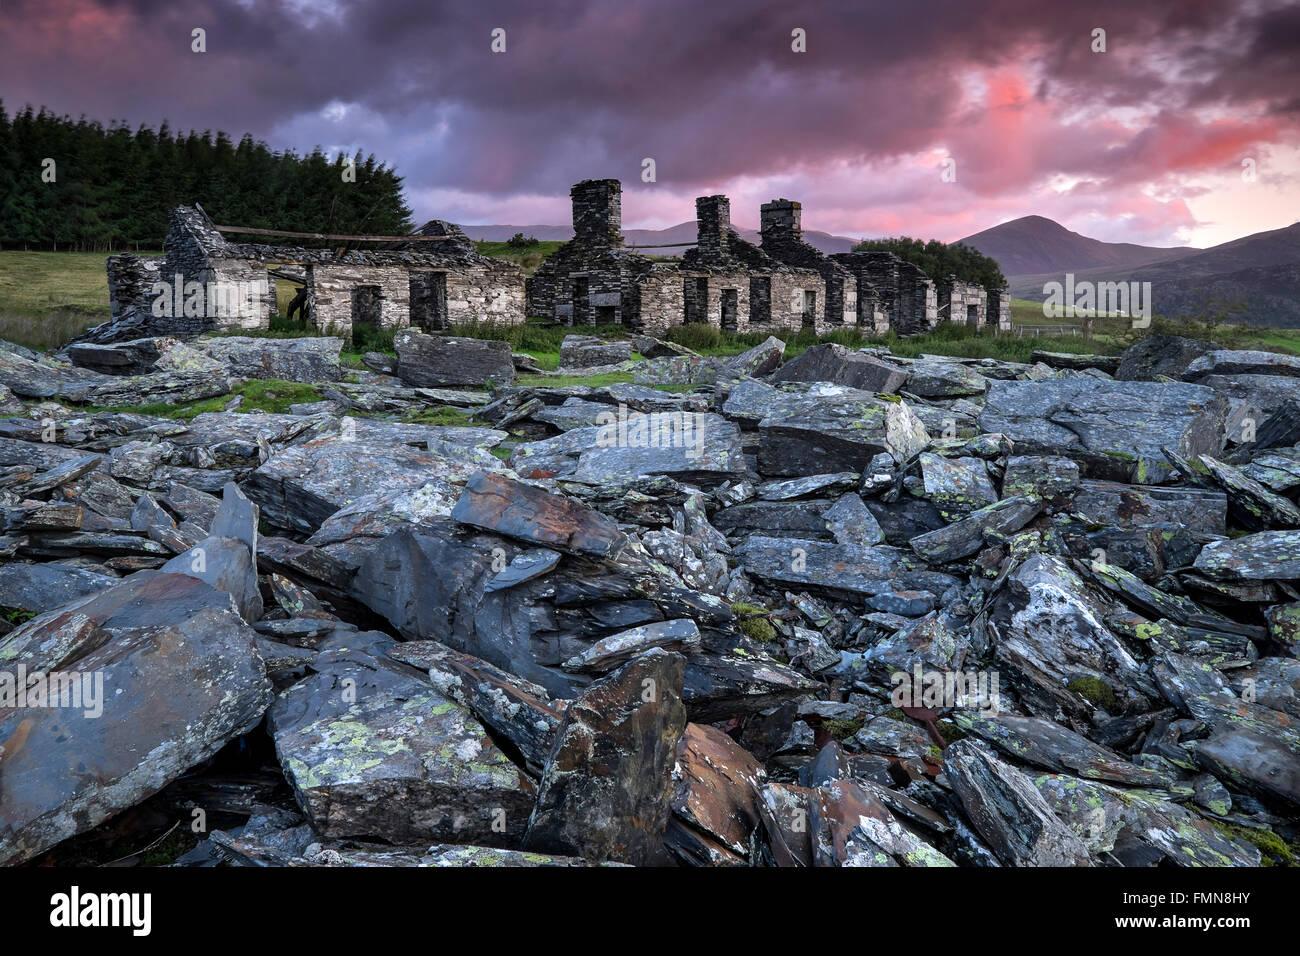 Rhos Barracks at Sunrise, Rhos Quarry, Moel Siabod, Snowdonia, North Wales, UK - Stock Image